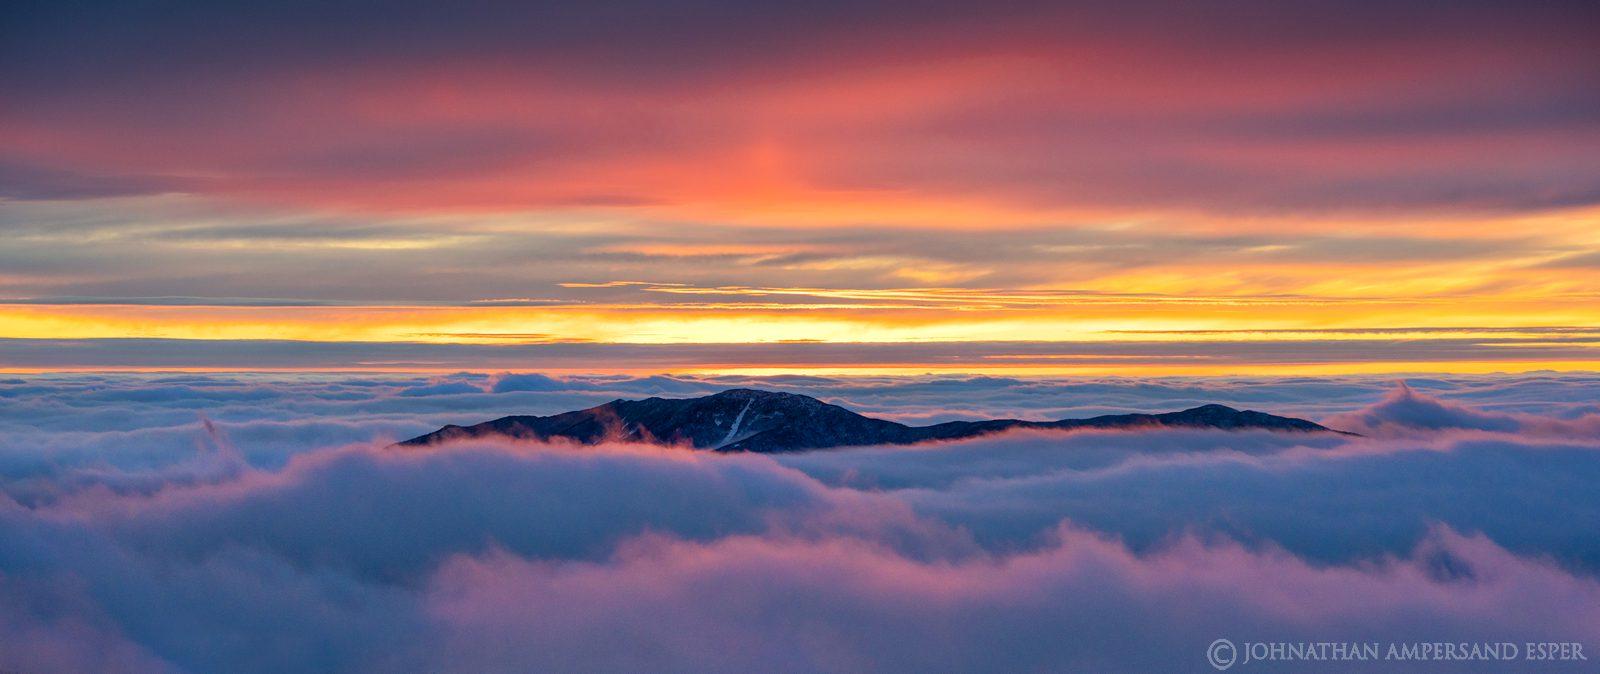 Santanoni Peak,Santanoni,January,winter,Algonquin,above the clouds,clouds,cloud inversion,2021,High Peaks